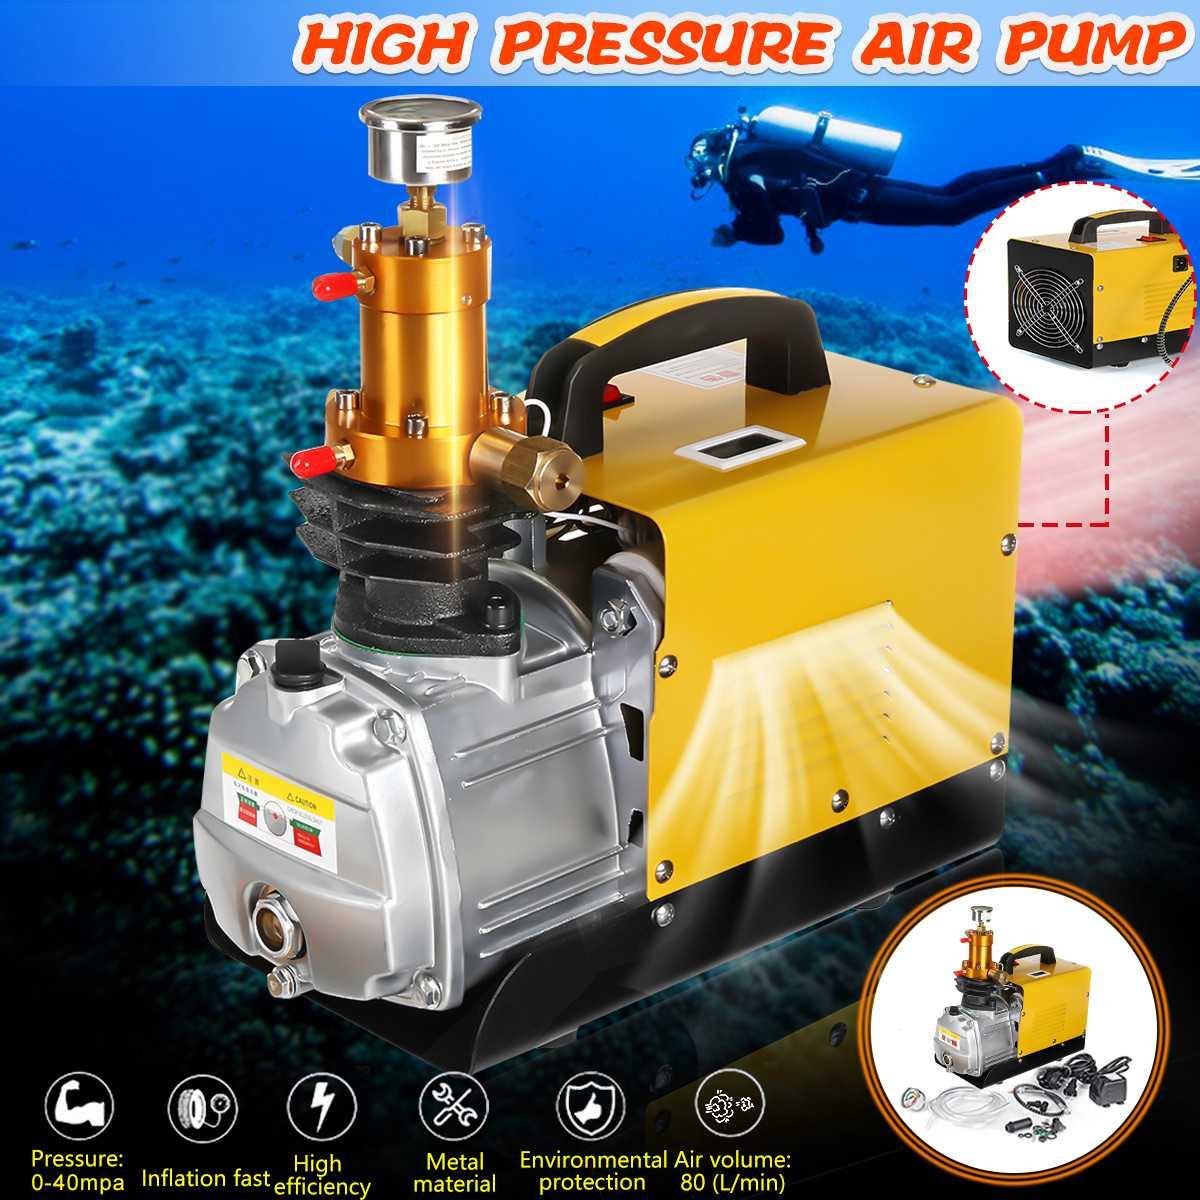 30MPA Portable High Pressure Air Pump Electric Air Compressor For Pneumatic Airgun Scuba Rifle PCP Inflator 220V